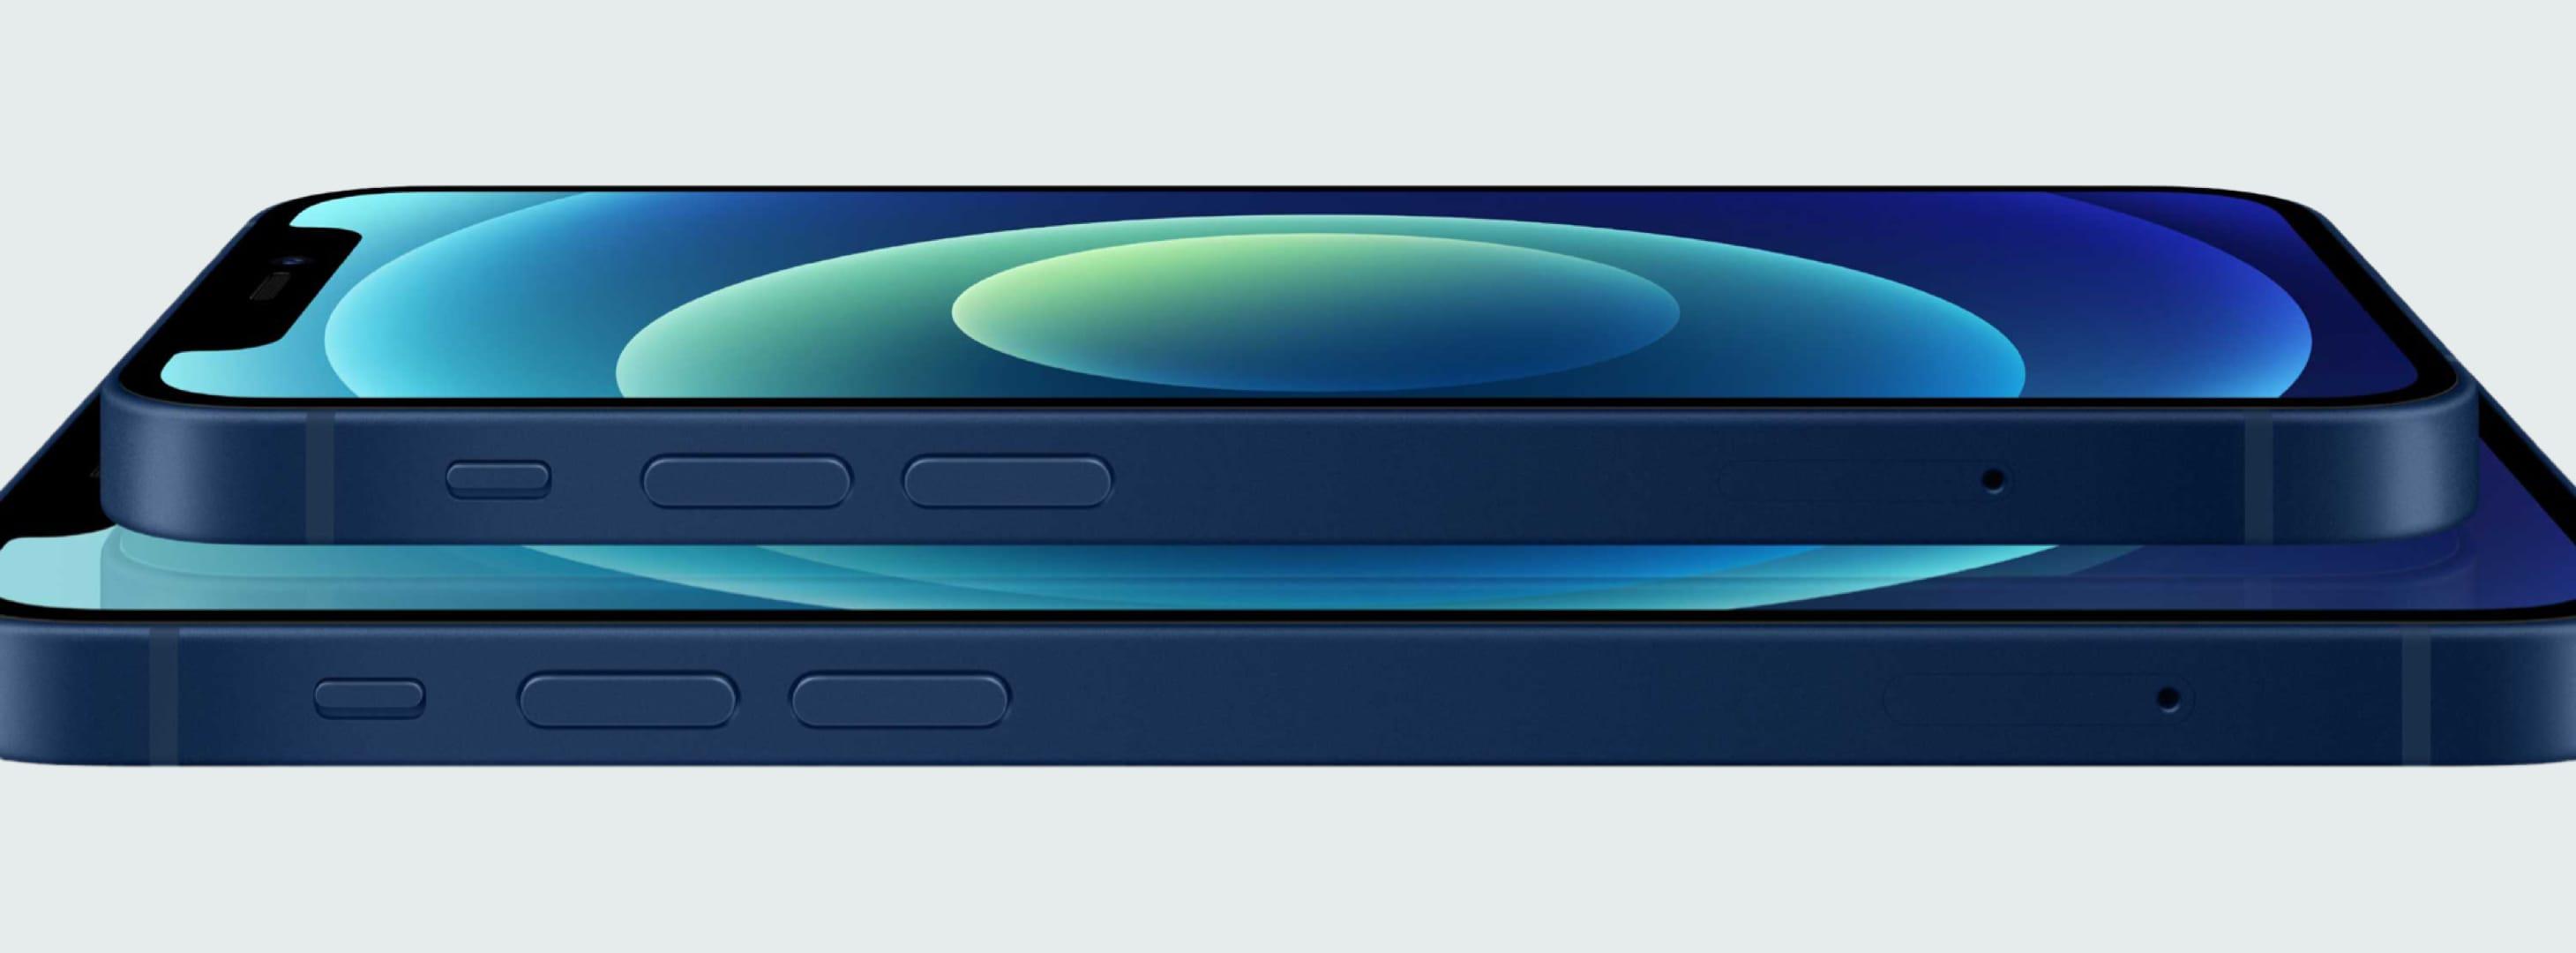 allapplenews-iphone-12-and-12-mini-blue